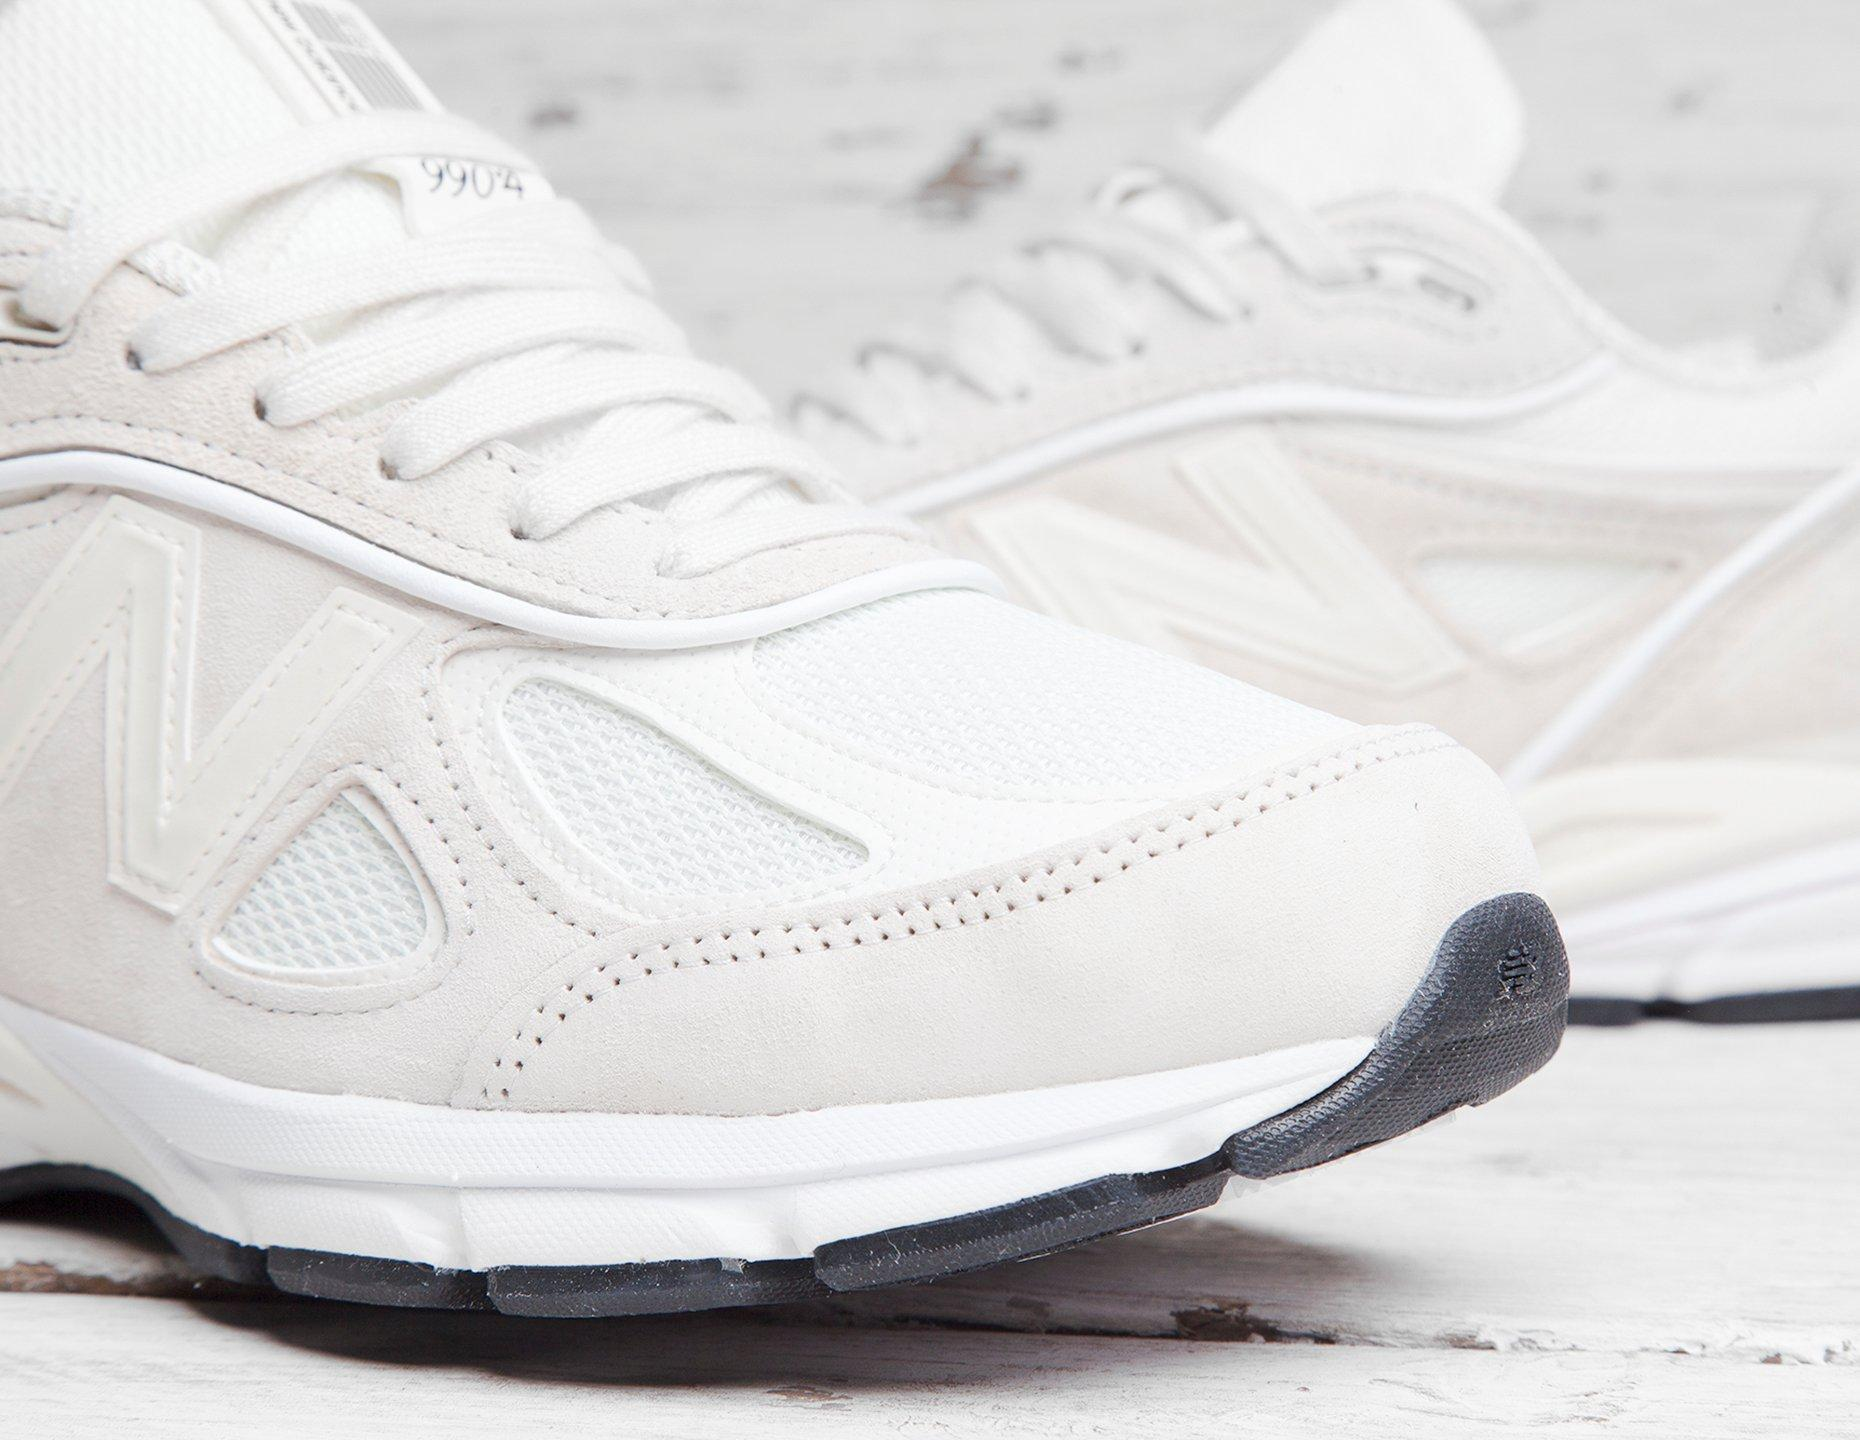 sports shoes 4eb32 dc275 New Balance White X Stussy 990v4